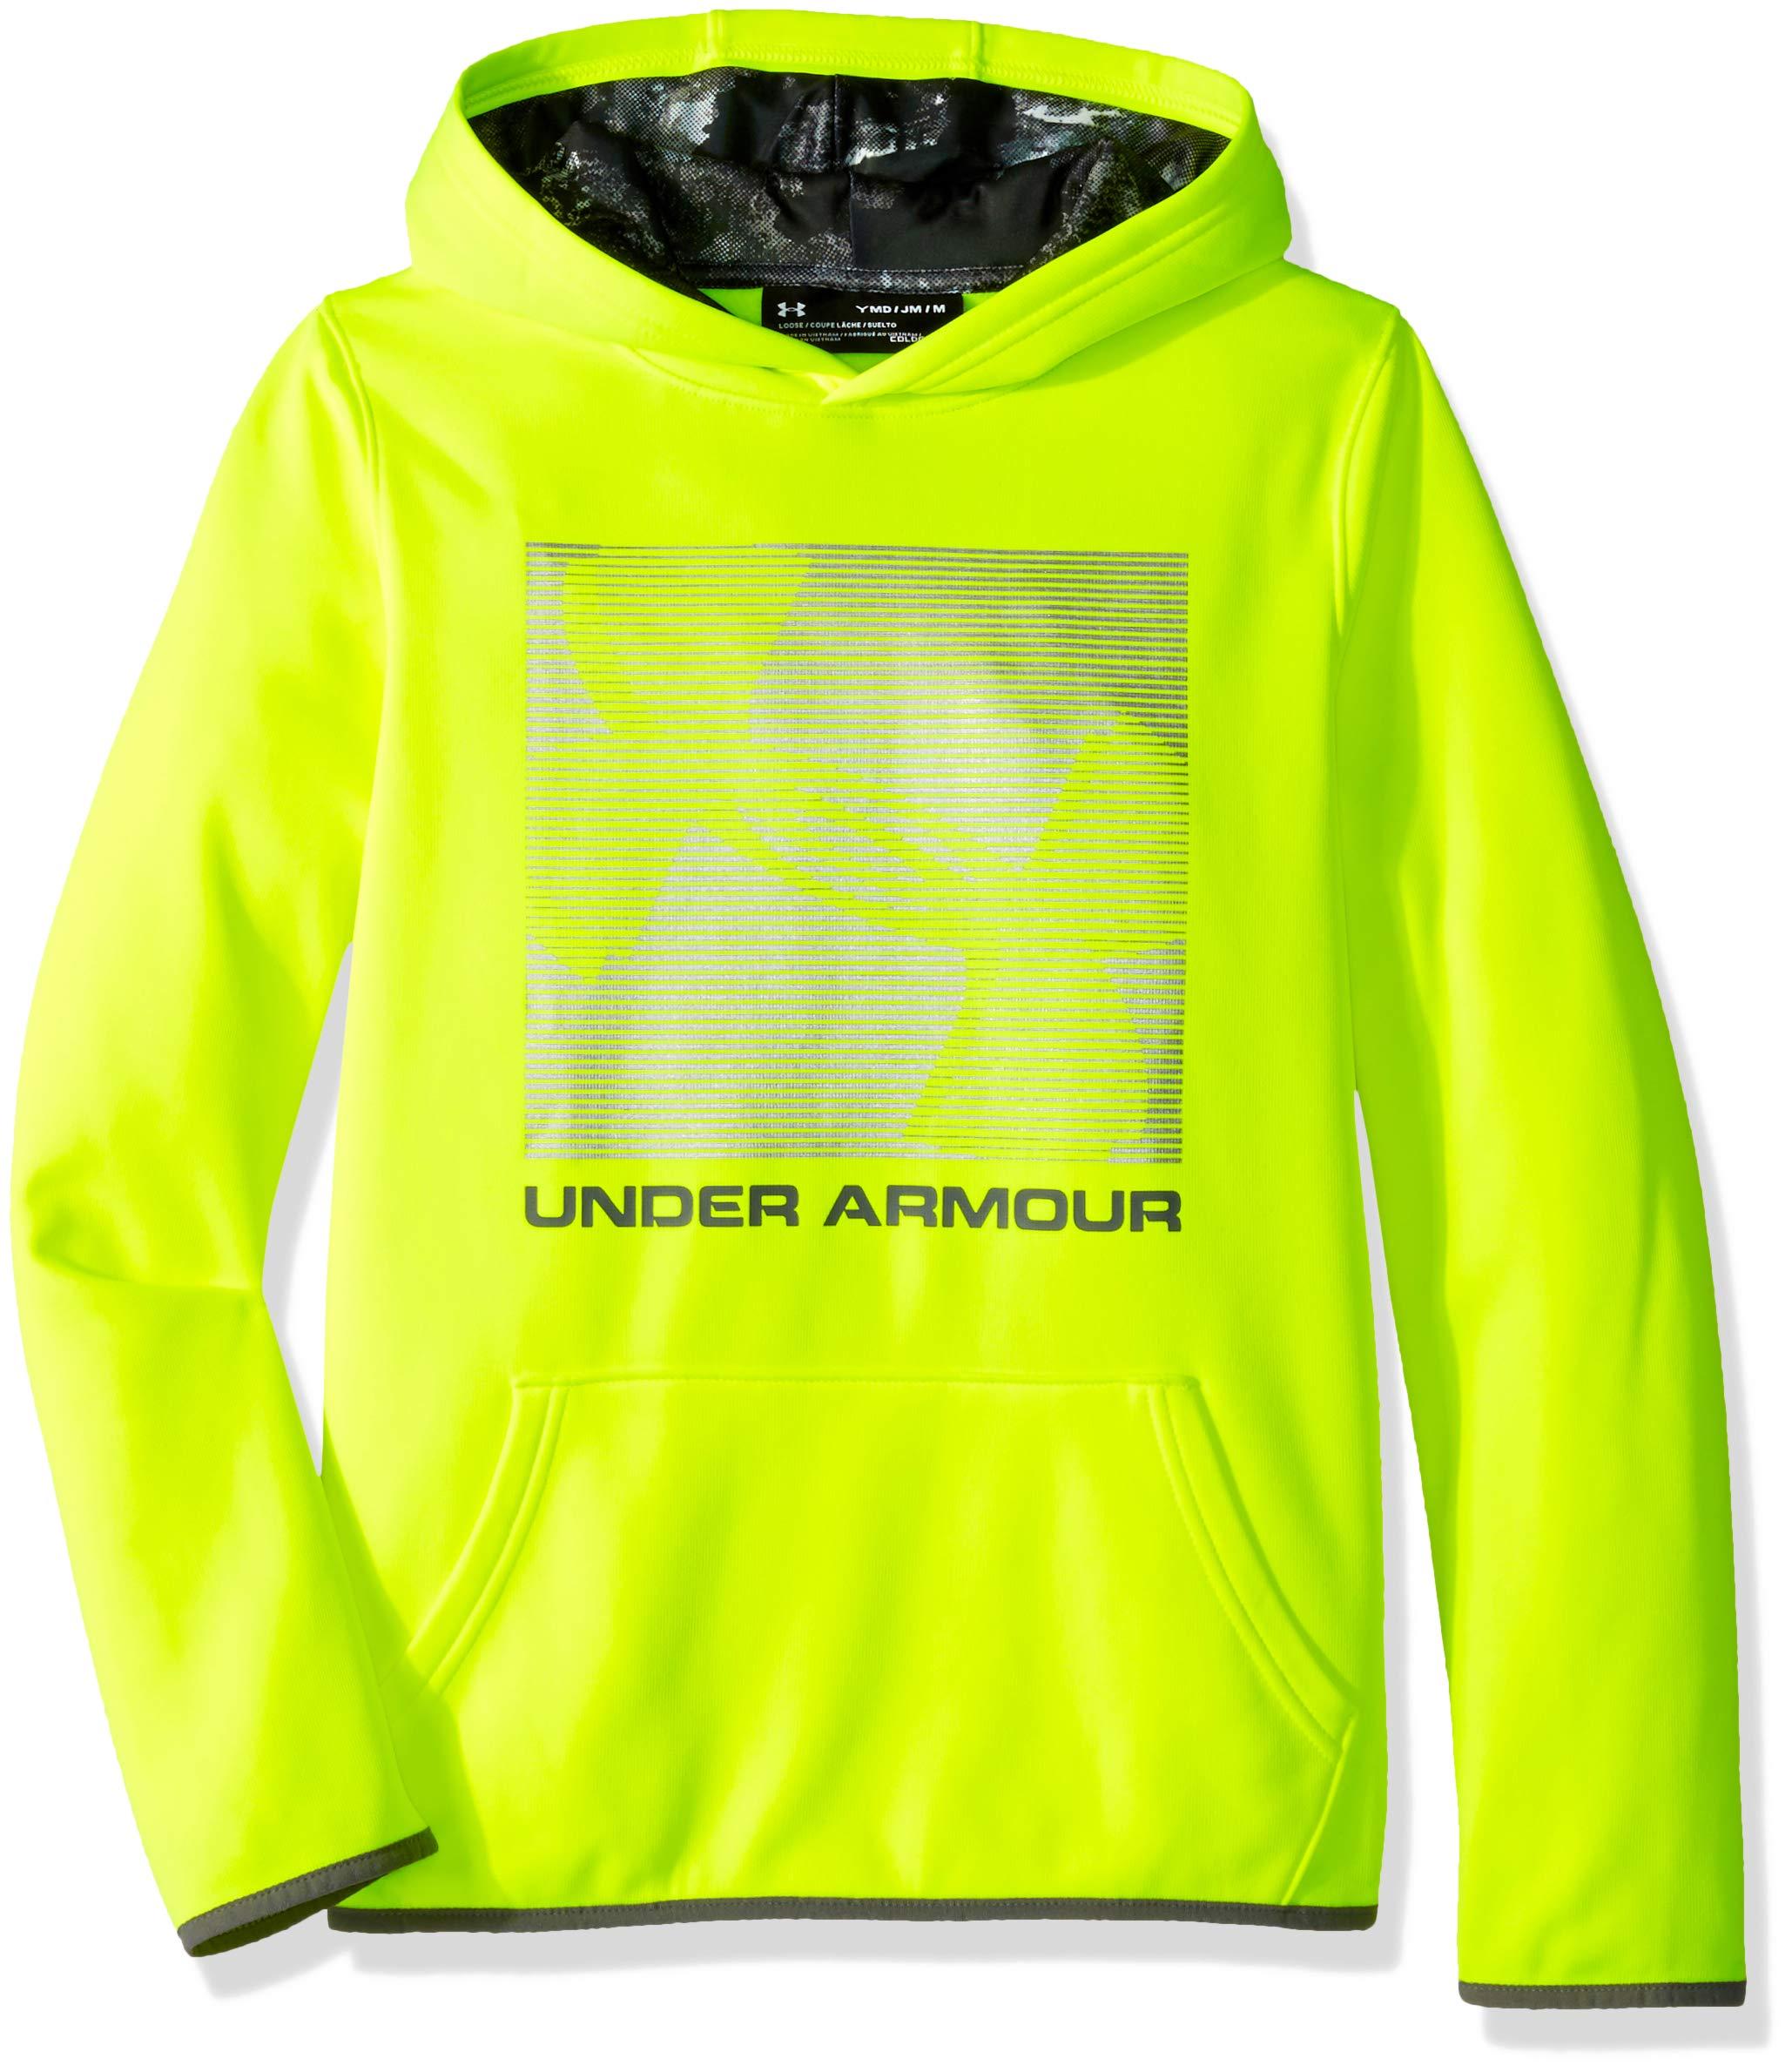 Under Armour Boys Armour Fleece Logo Hoodie, High-Vis Yellow (731)/Graphite, Youth Medium